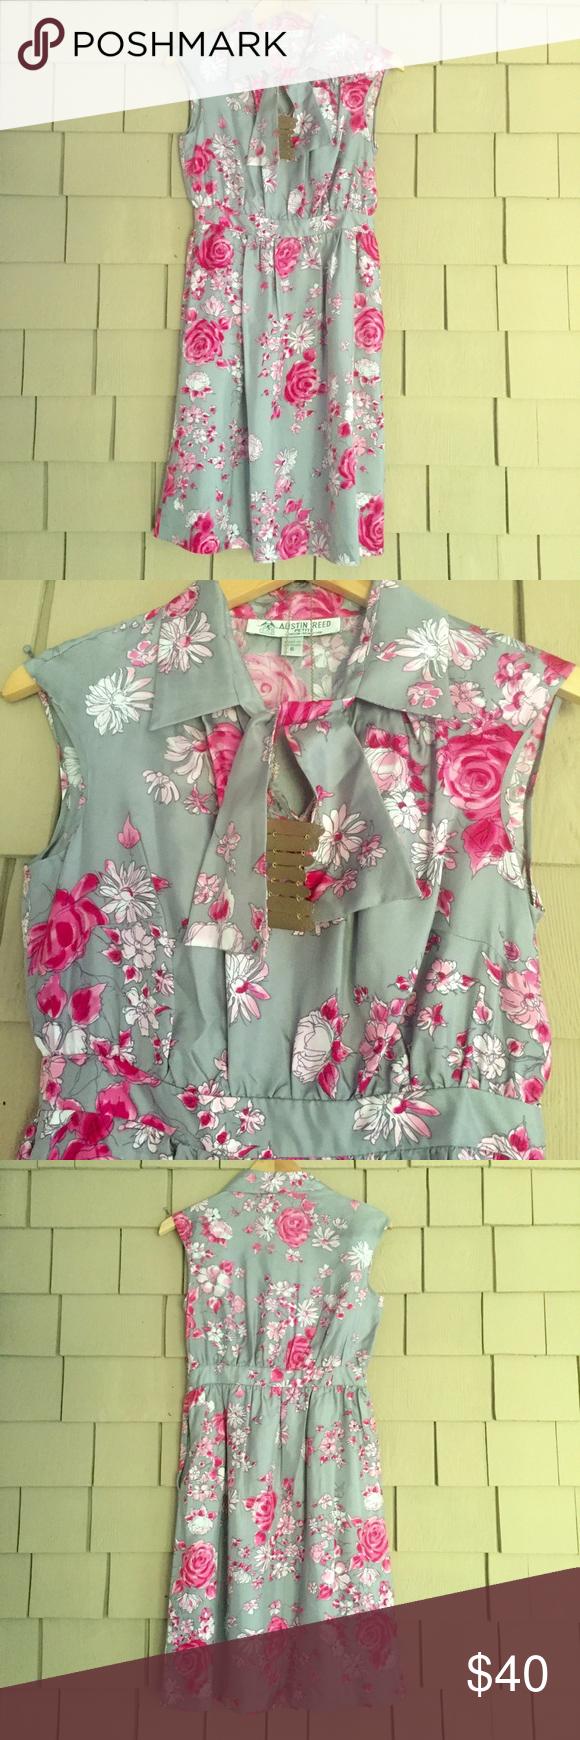 Sale Austin Reed Sleeveless Silk Dress Silk Print Dress Clothes Design Dresses